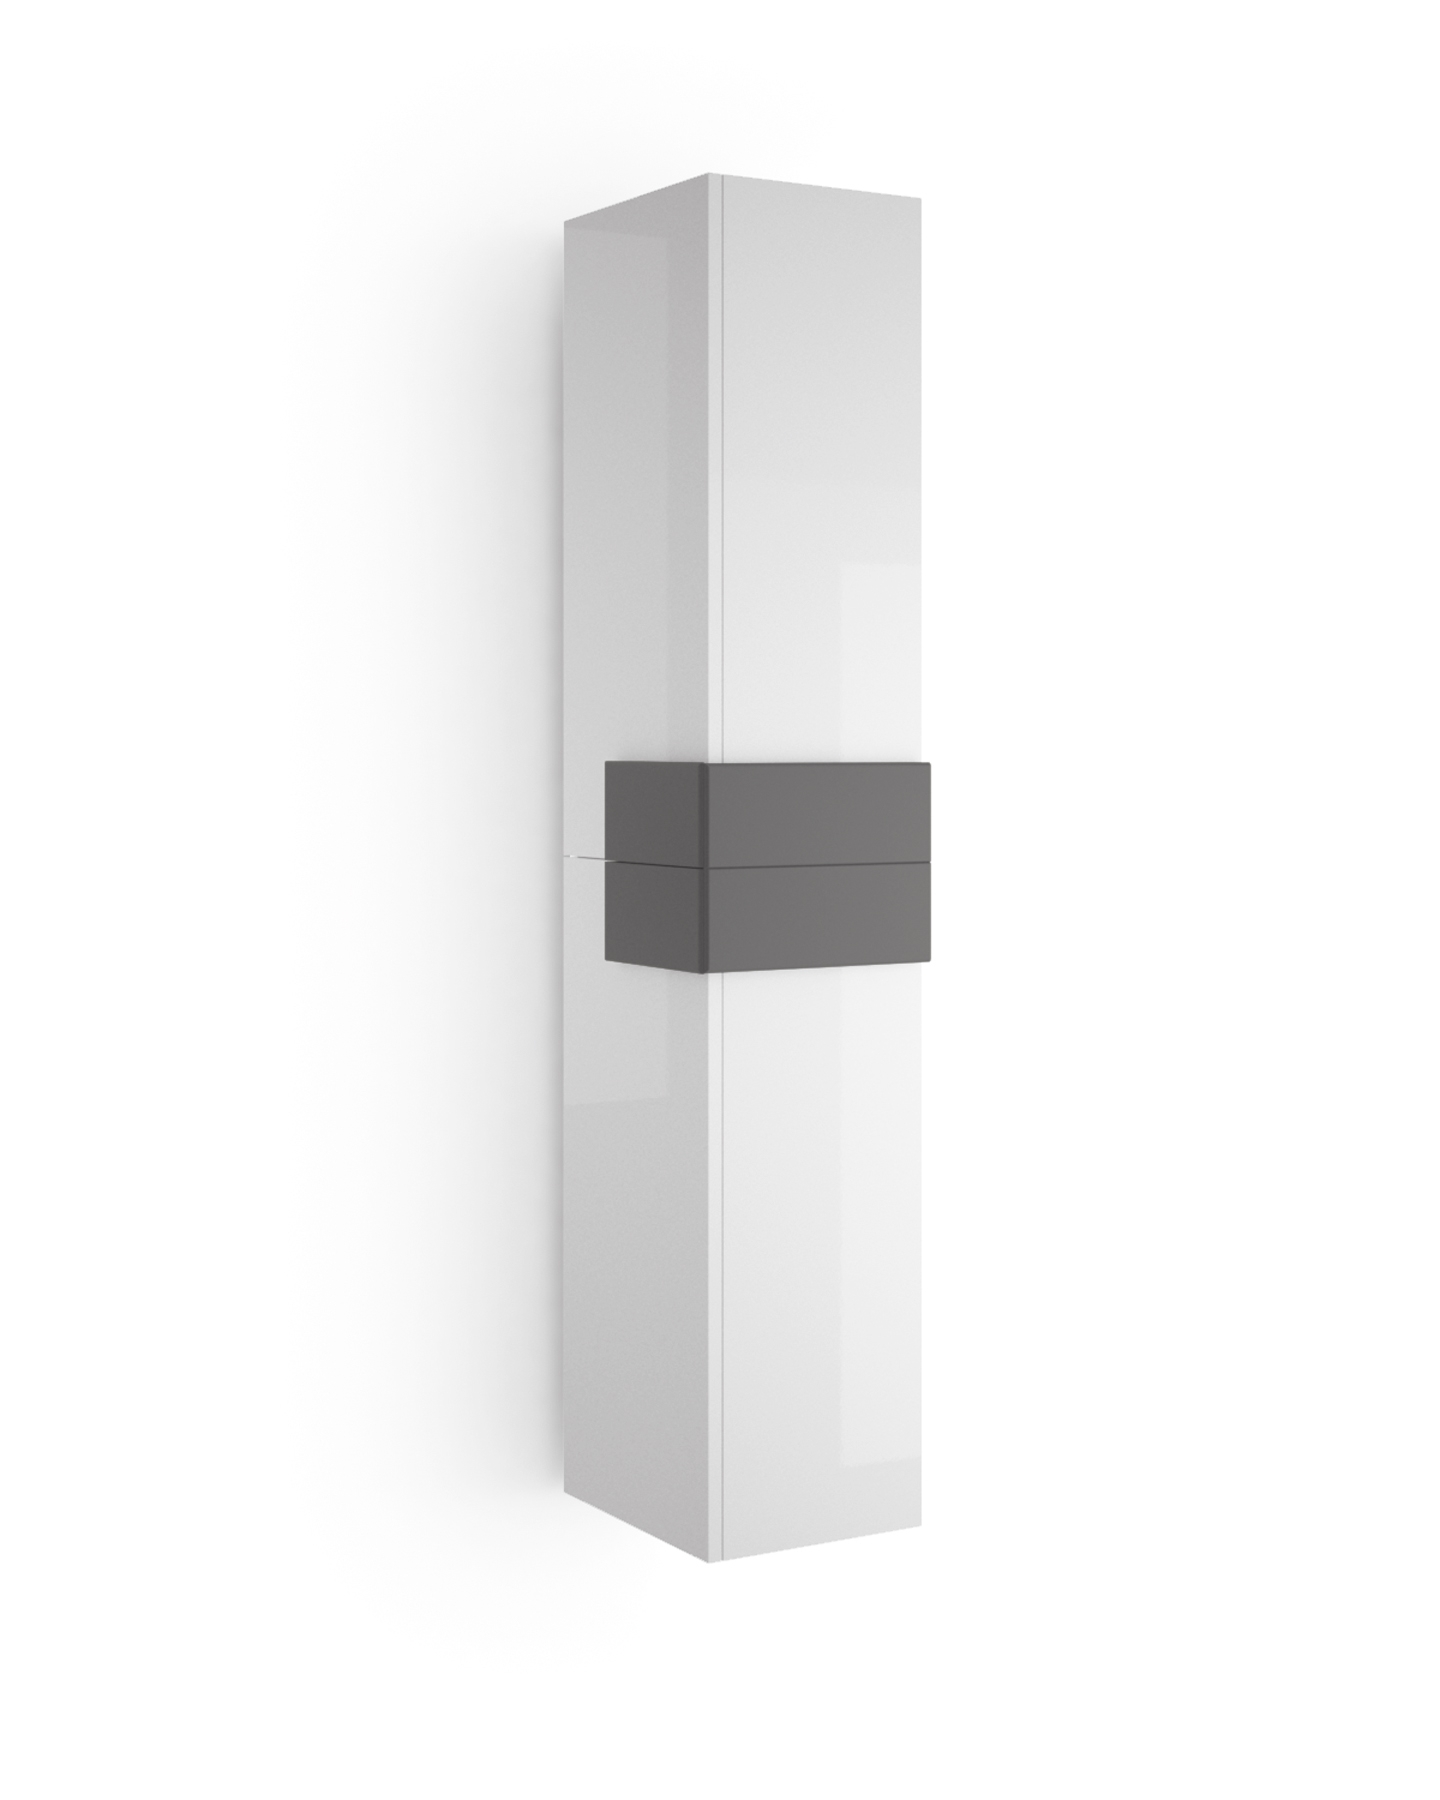 Muebles Cronos hoge kast 160cm wit - antraciet unieke afwerking